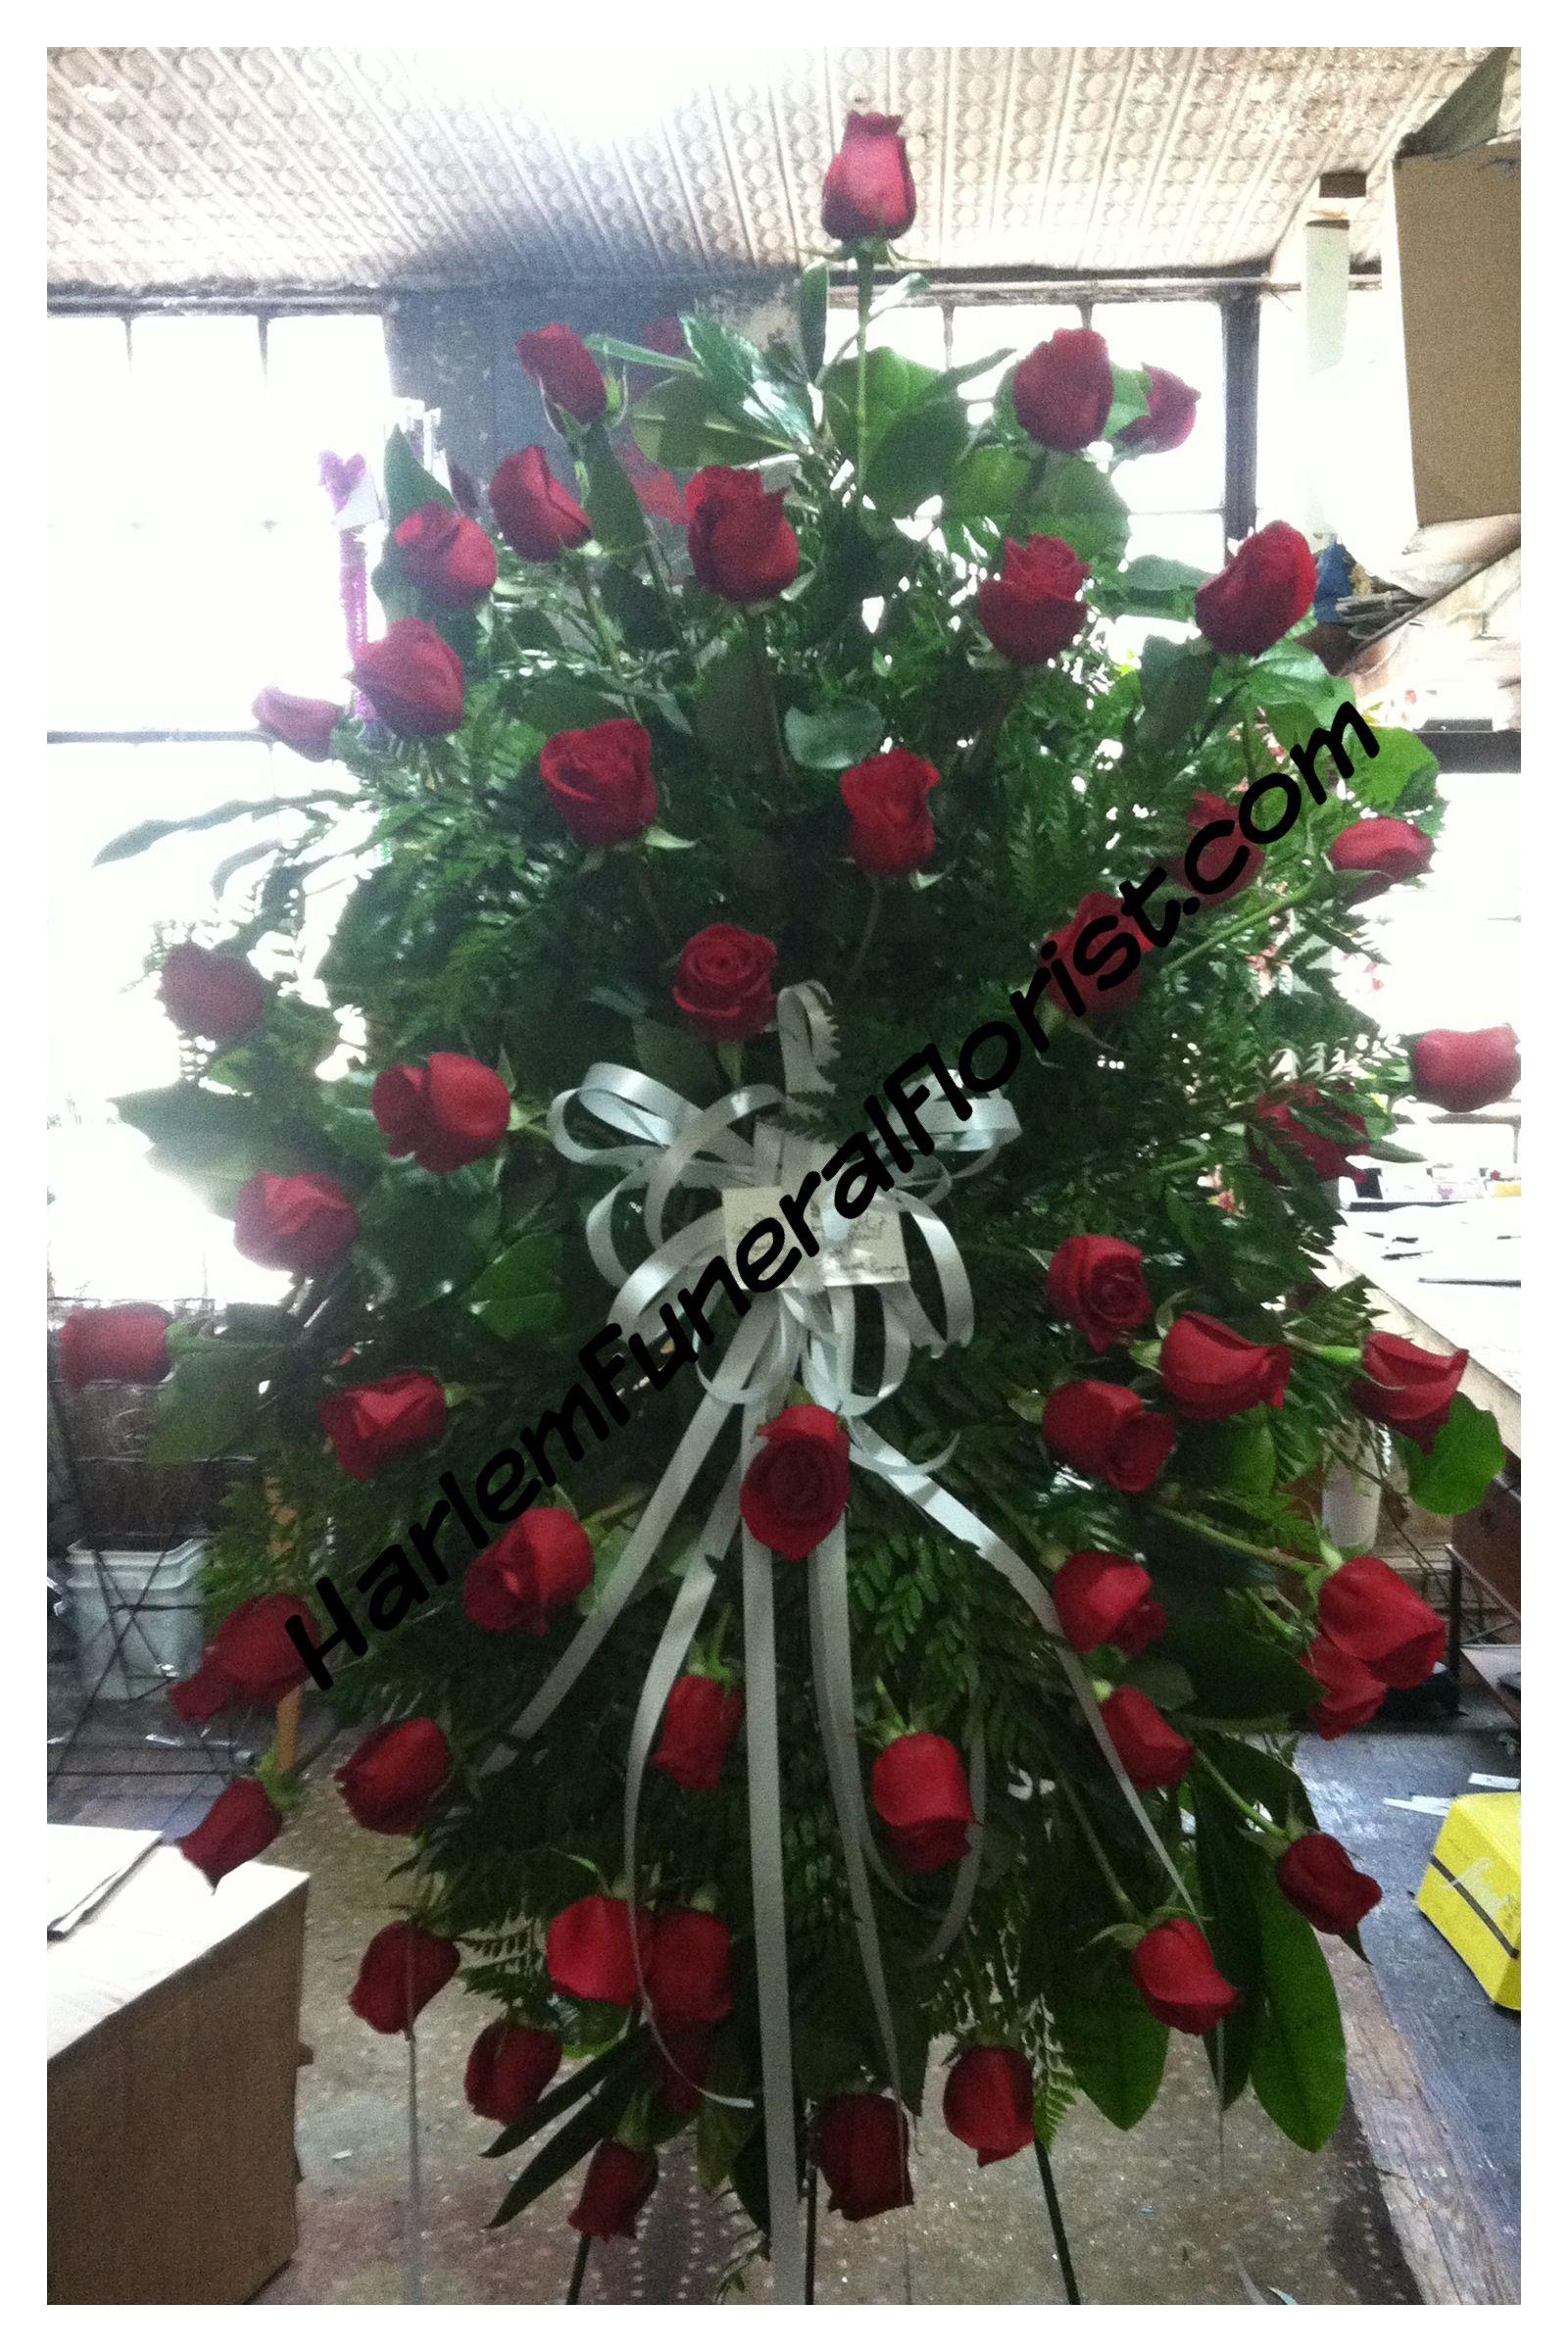 All Red Roses Funeral Flowers Memorial Flowers Funeral Flower Arrangements